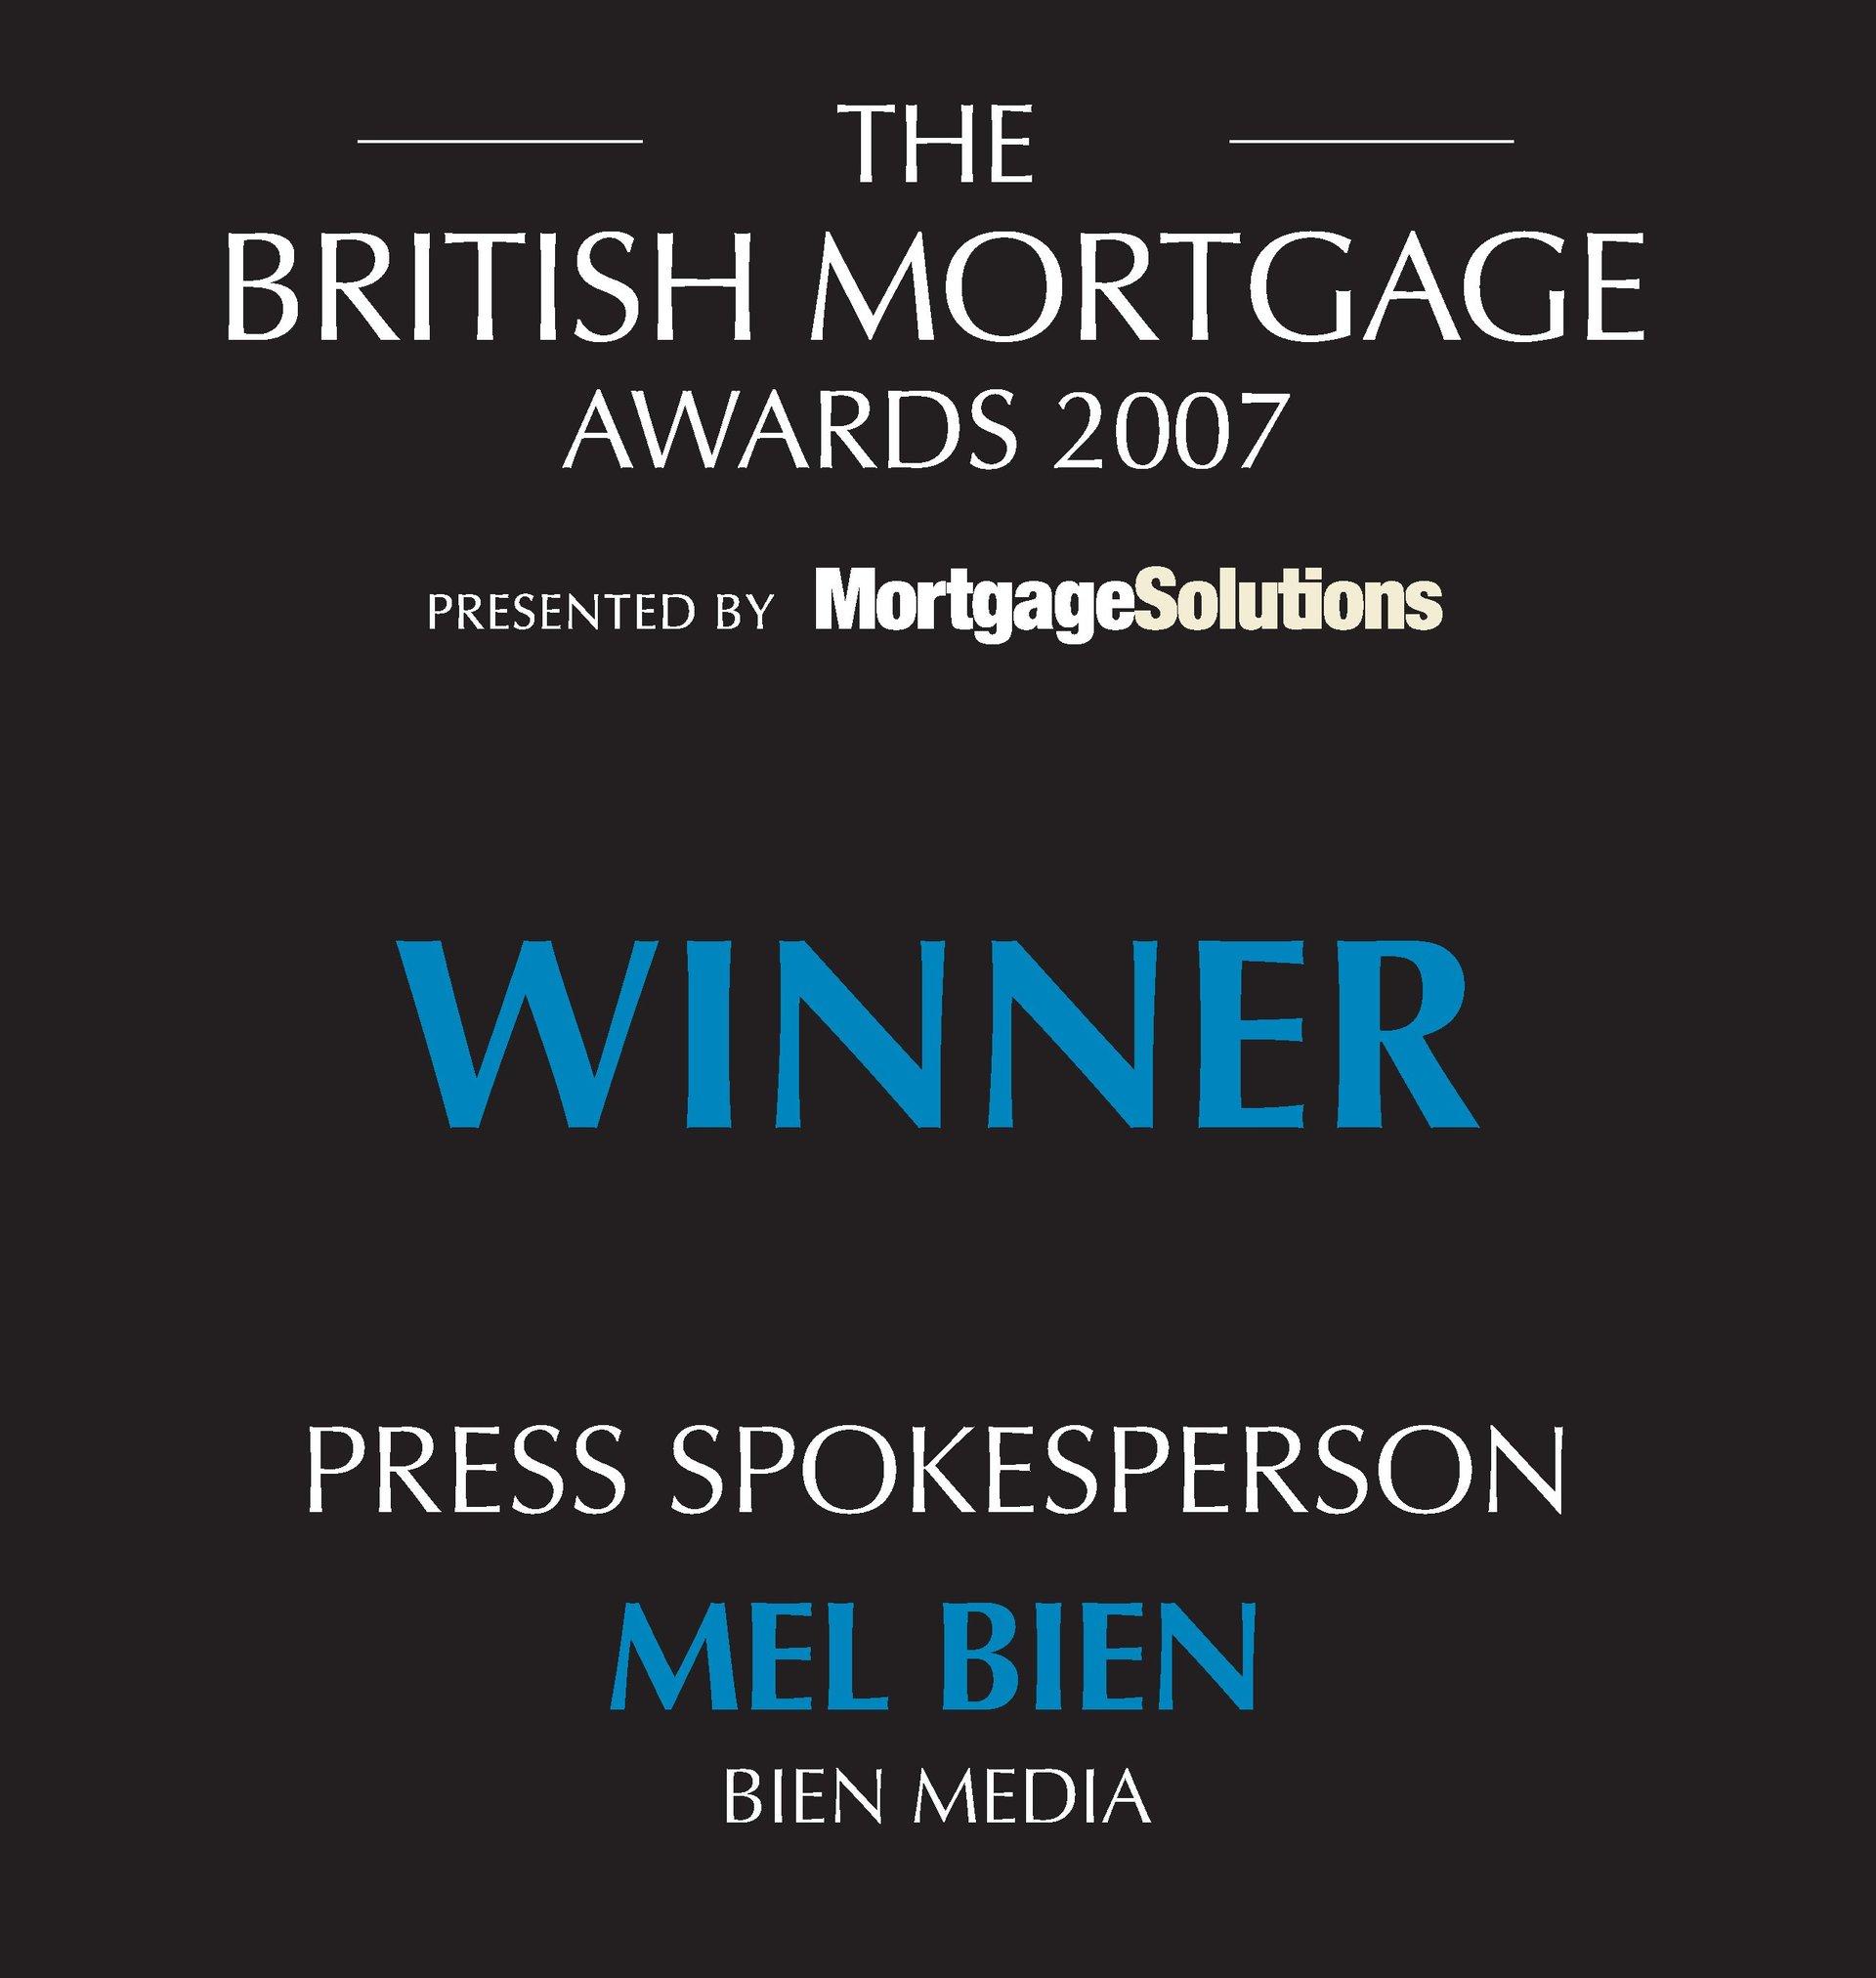 British Mortgage Awards Winner 2007